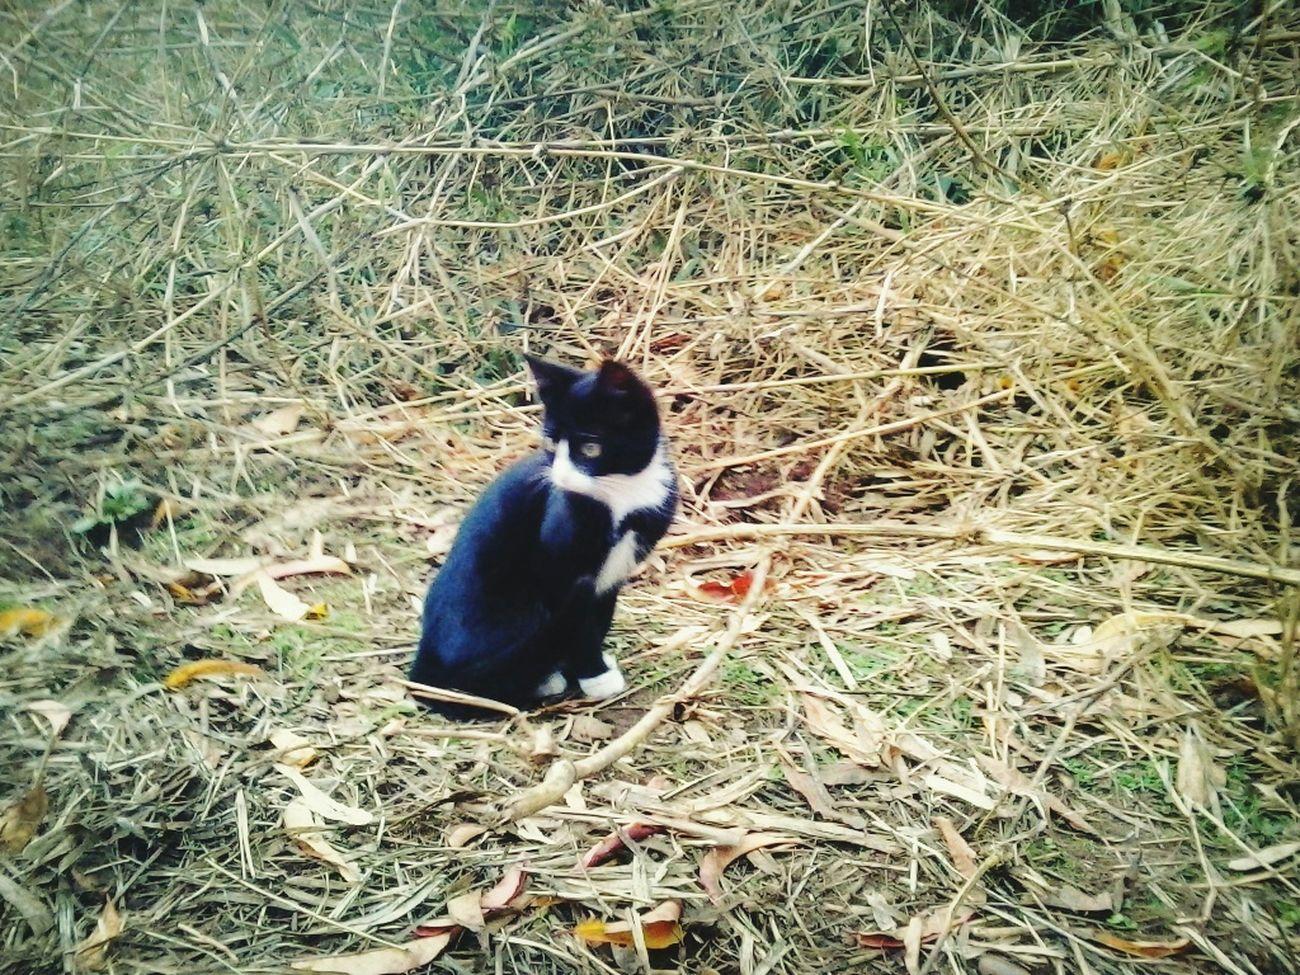 Venhus Mi Pequeña  Ilovecats Cats Collection